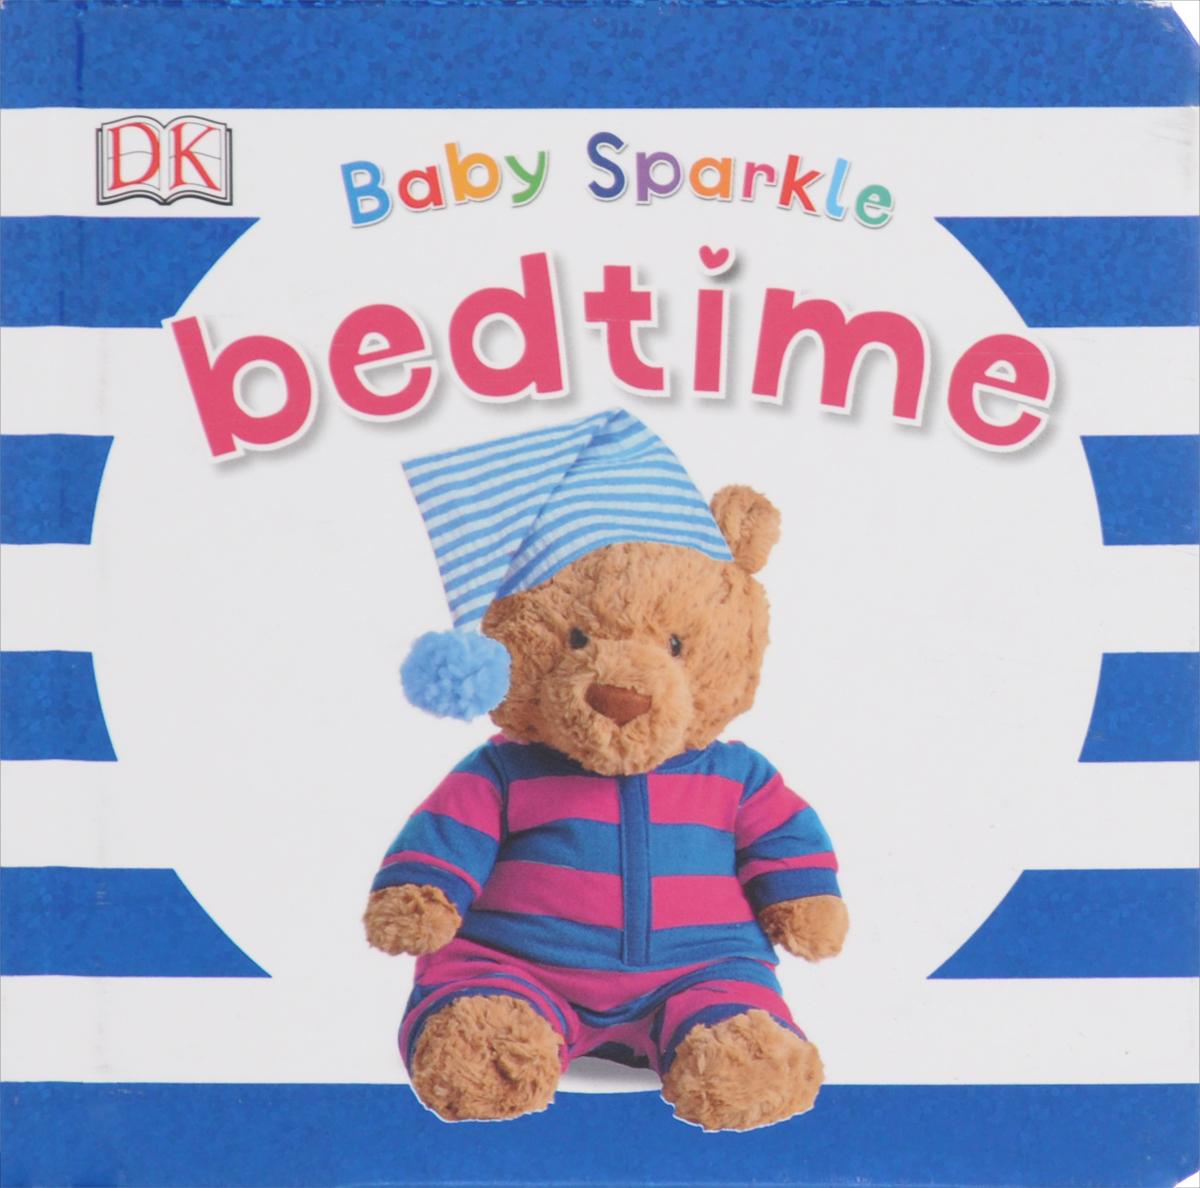 Baby Sparkle: Bedtime